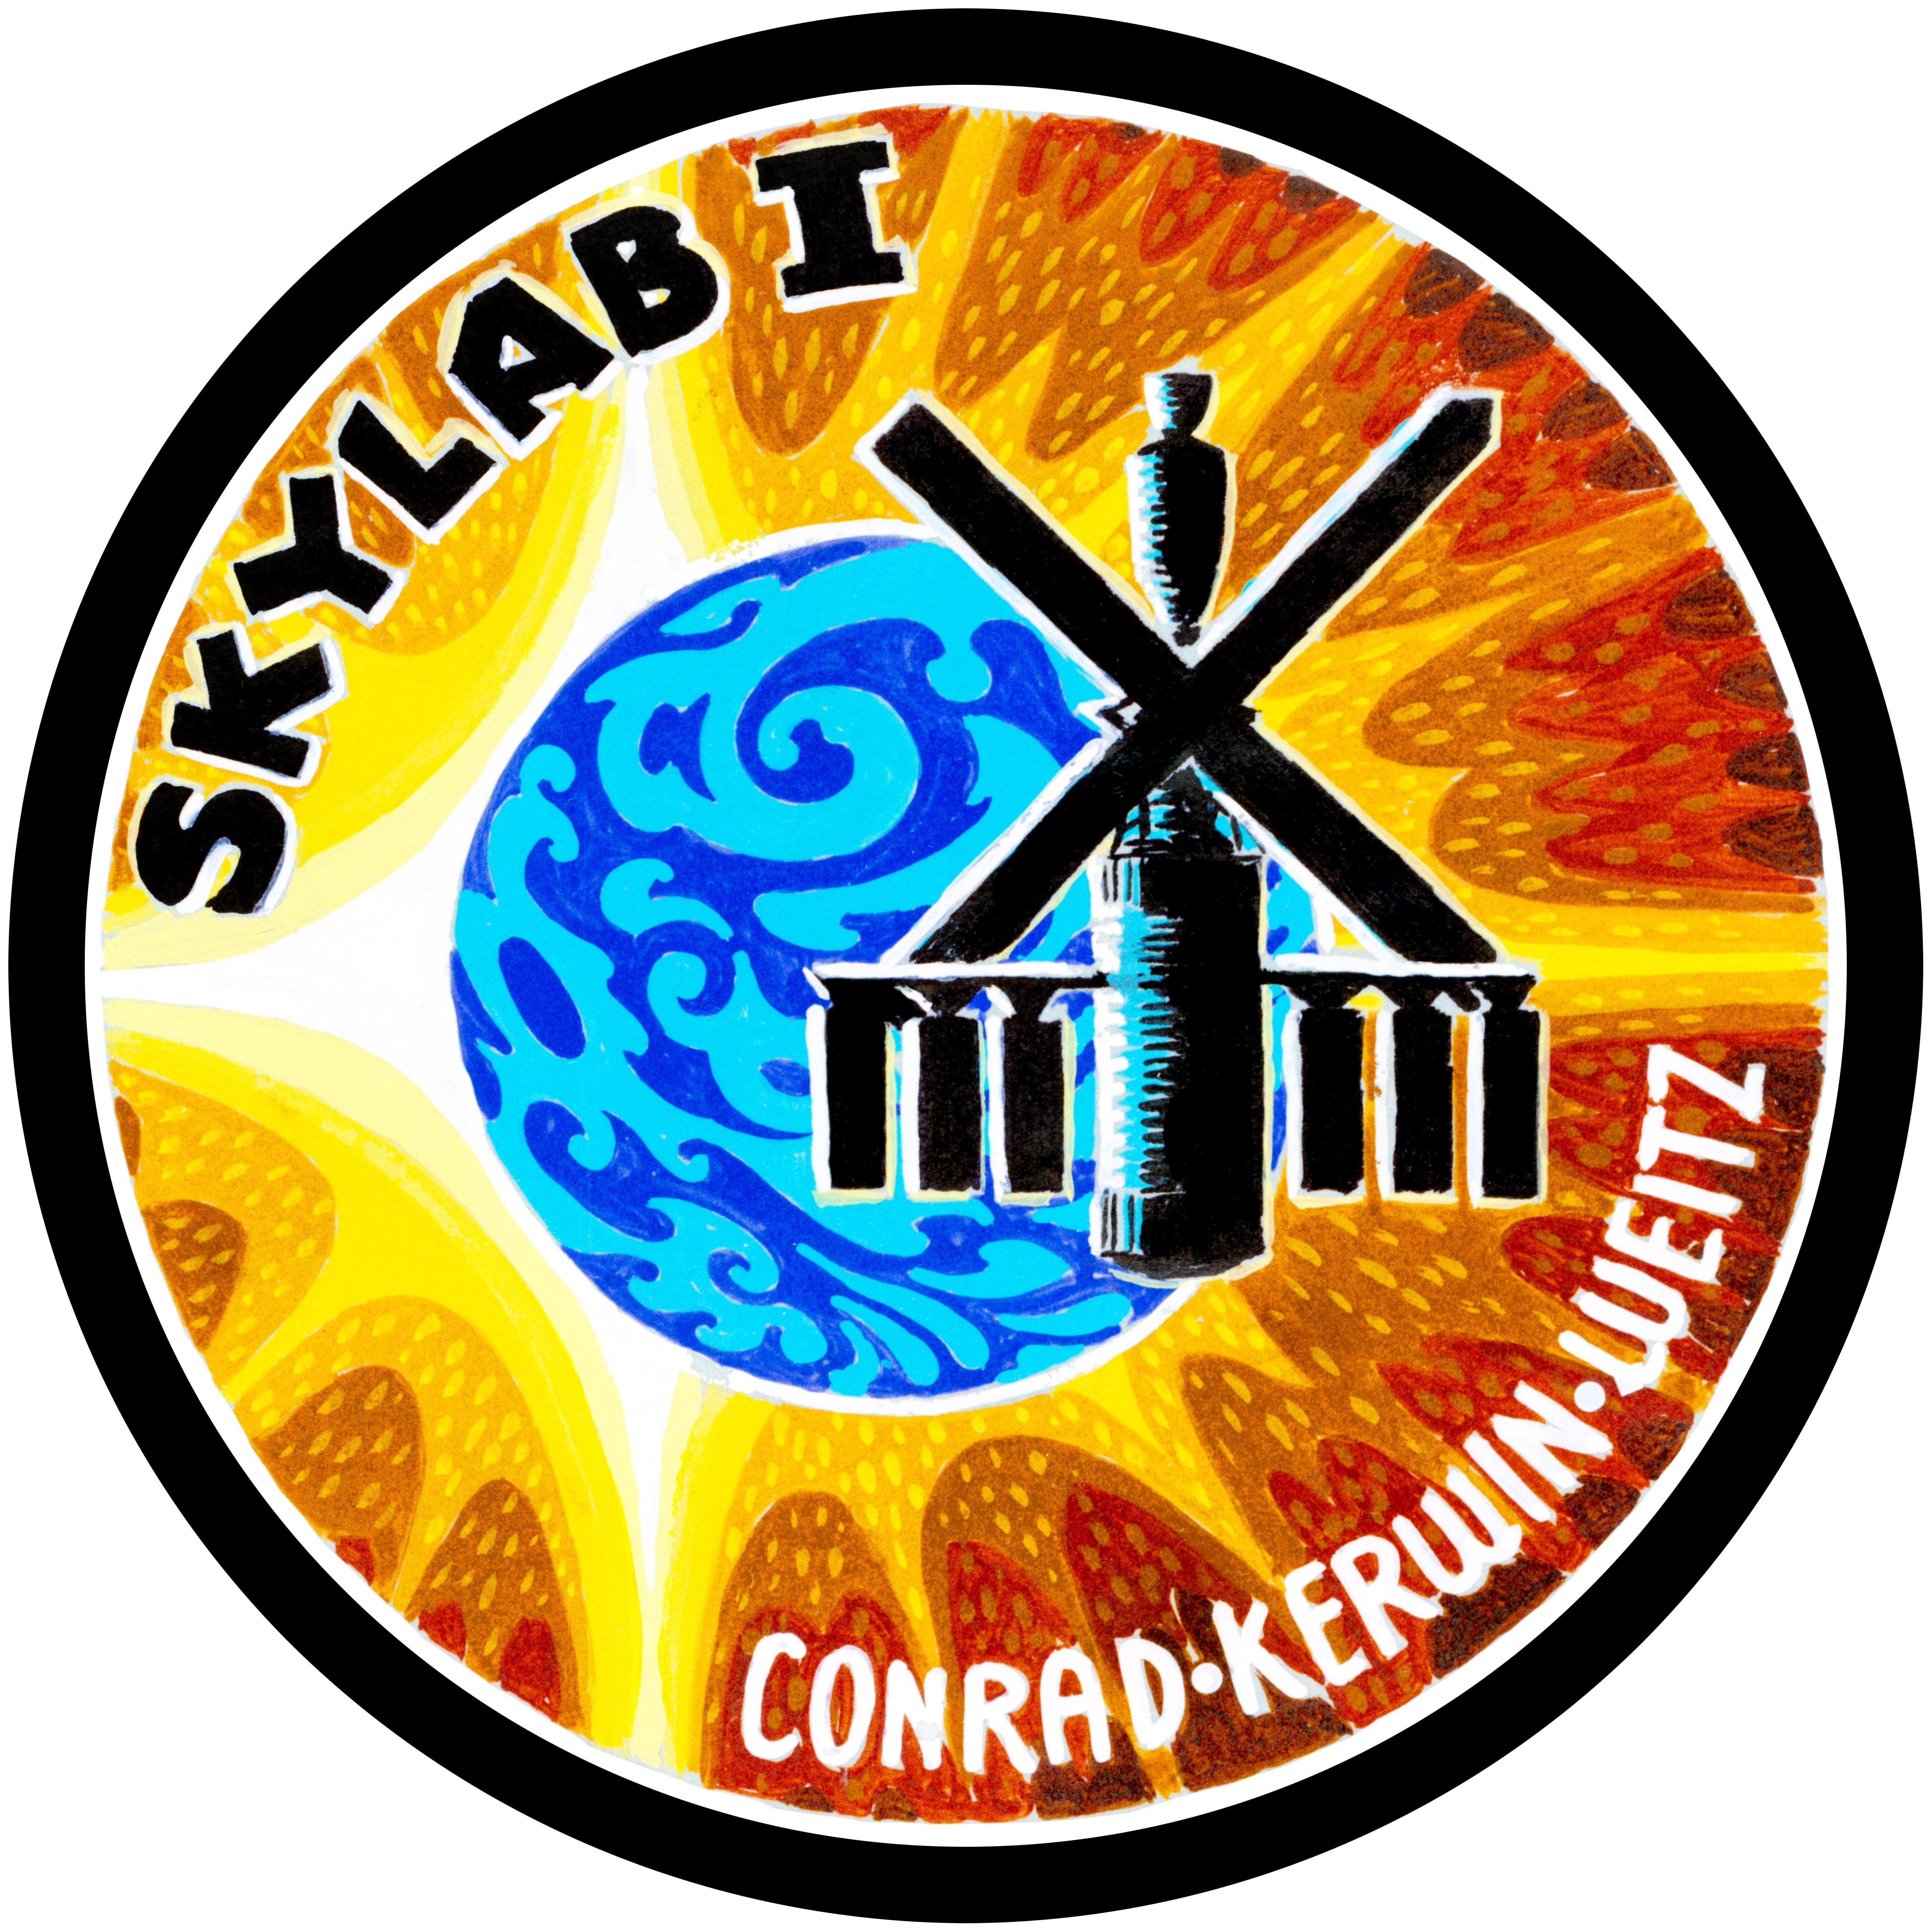 Désintégration de Skylab - 11.7.1979 Skylab1-Patch